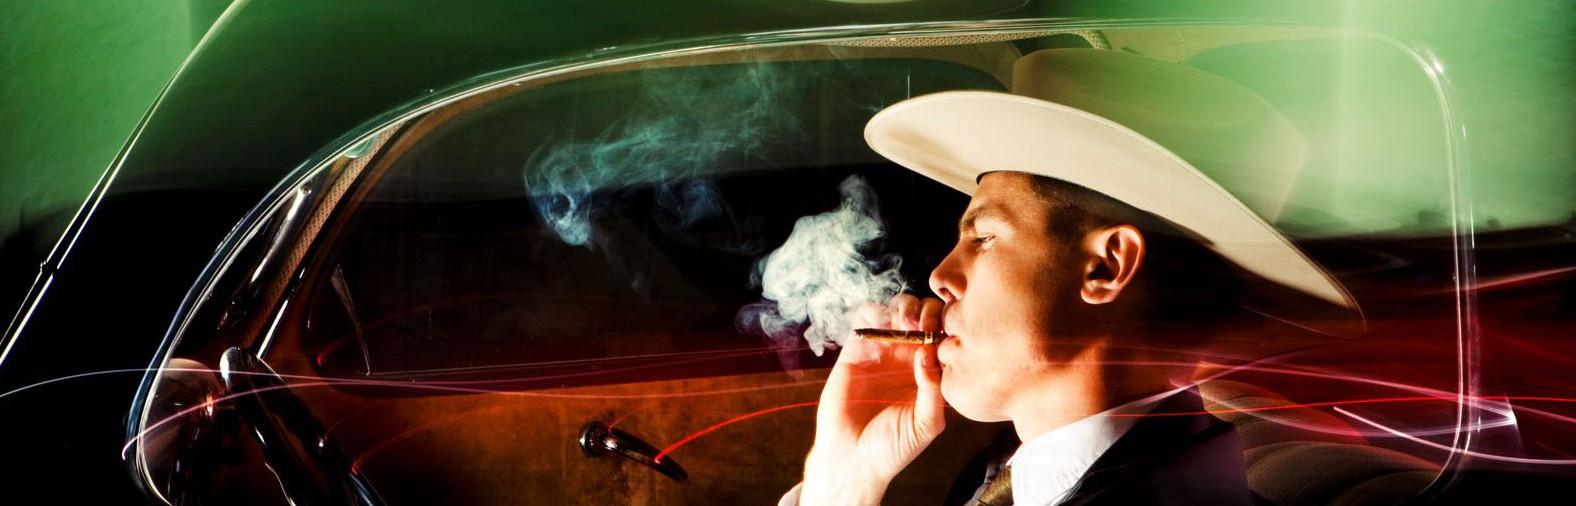 The-Killer-inside-me-smoke Casey Affleck